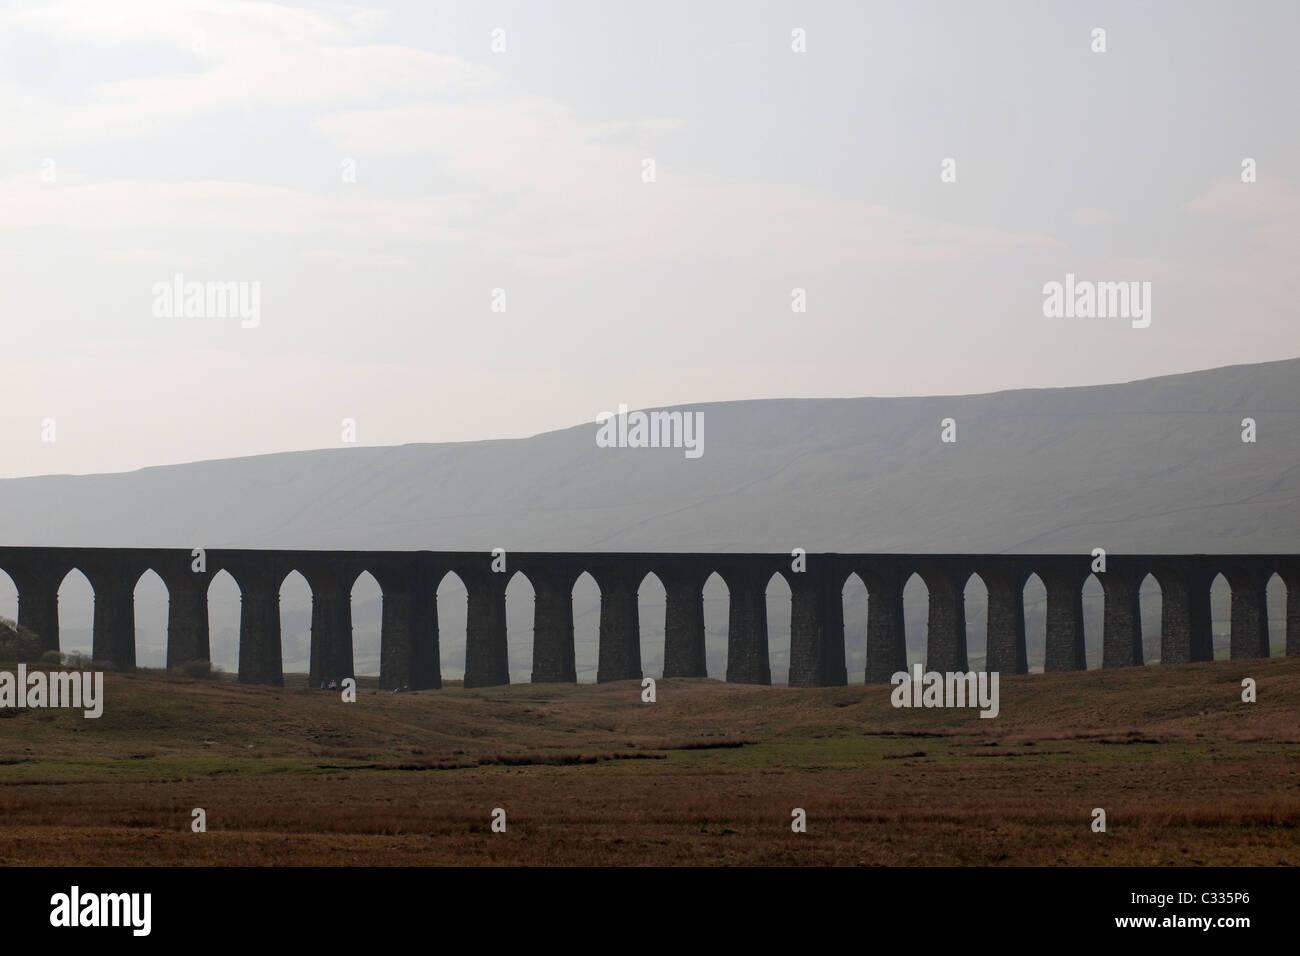 Ribblehead Viaduct Yorkshire Dales England Britain UK - Stock Image